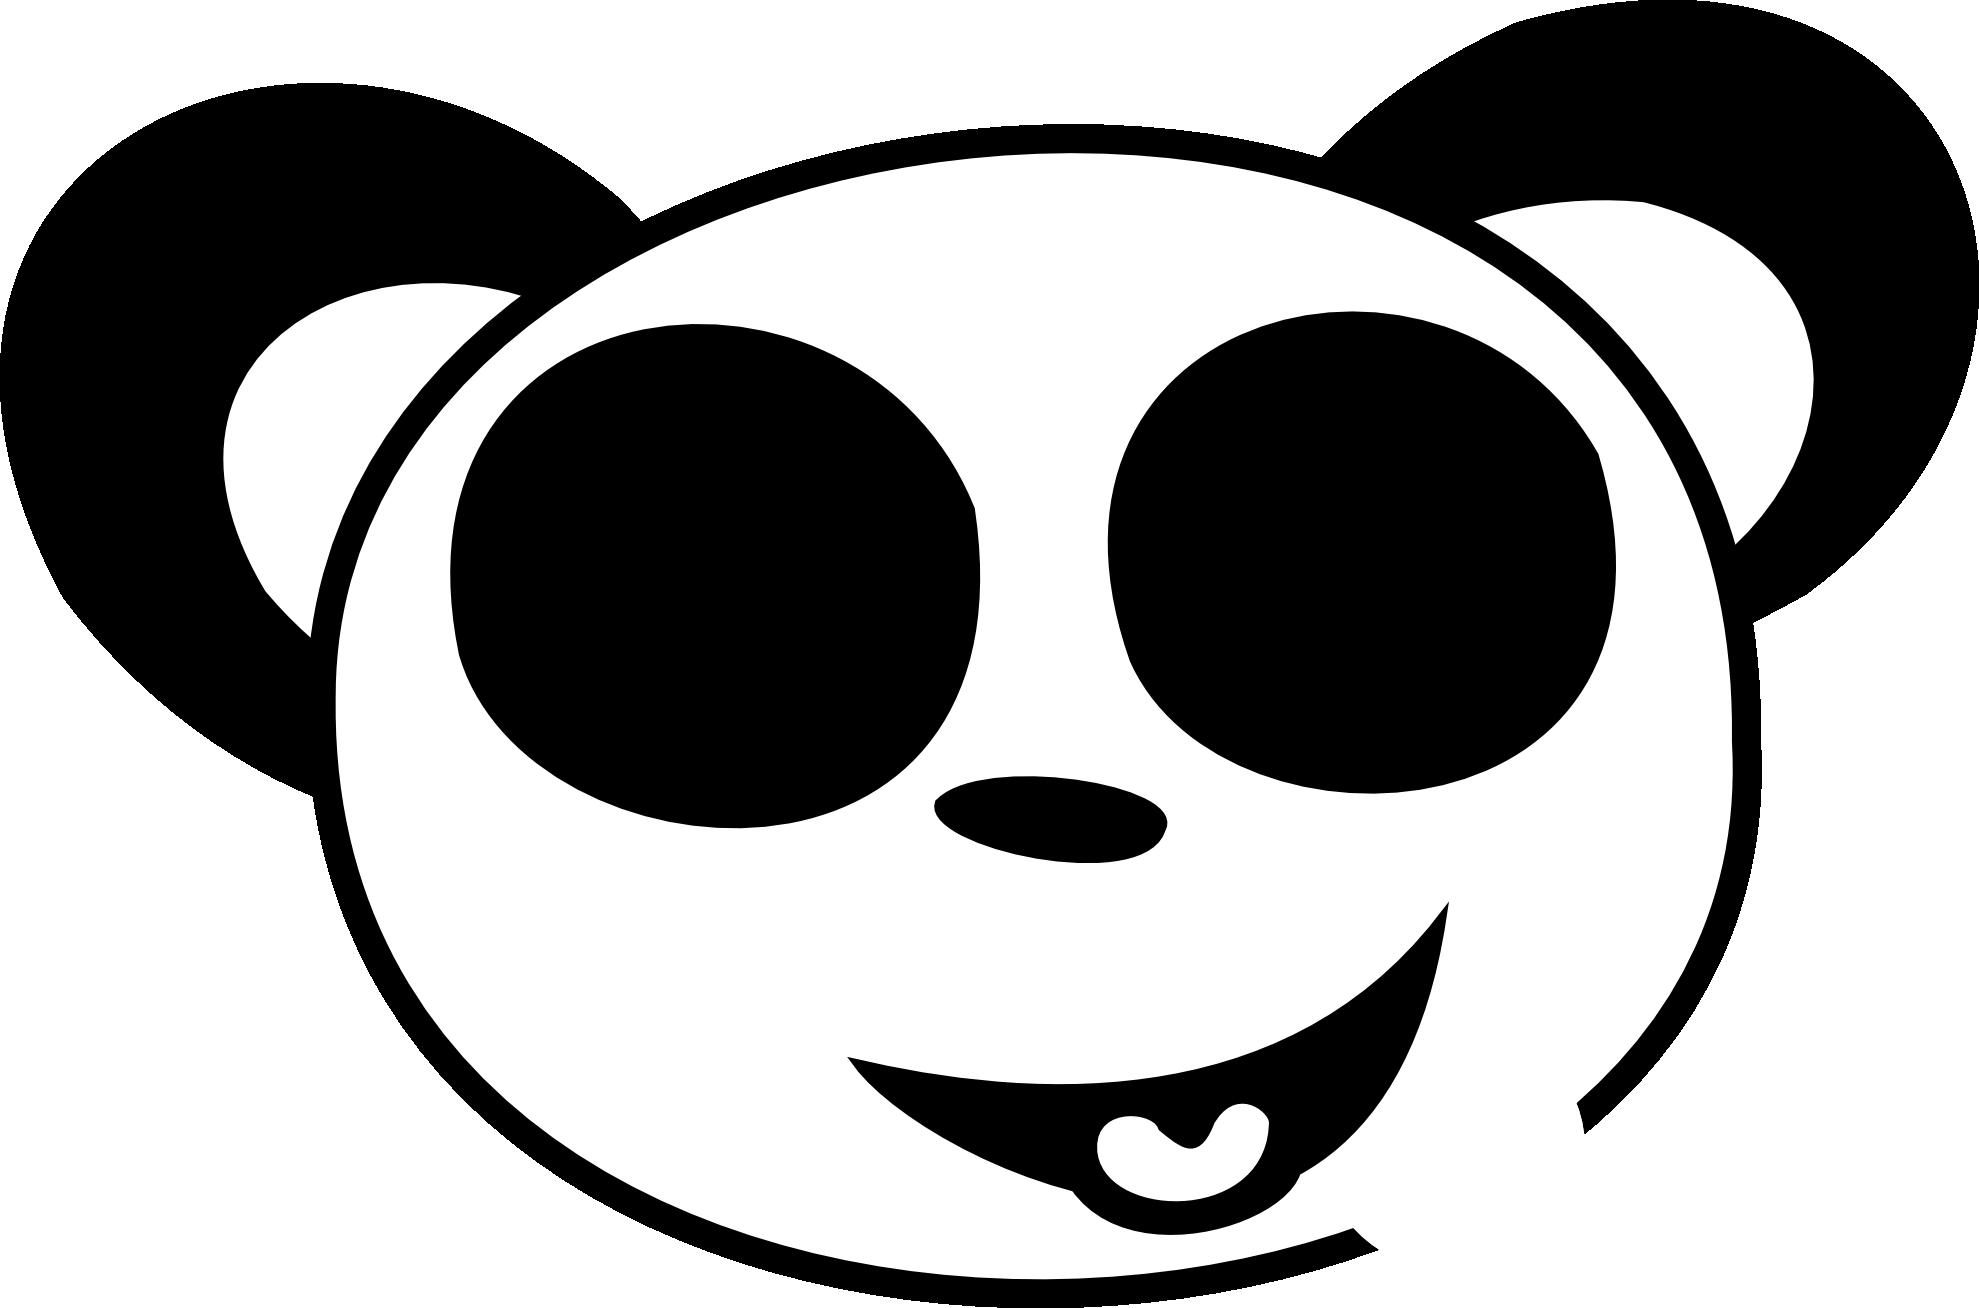 Panda Clipart Black And White-panda clipart black and white-8